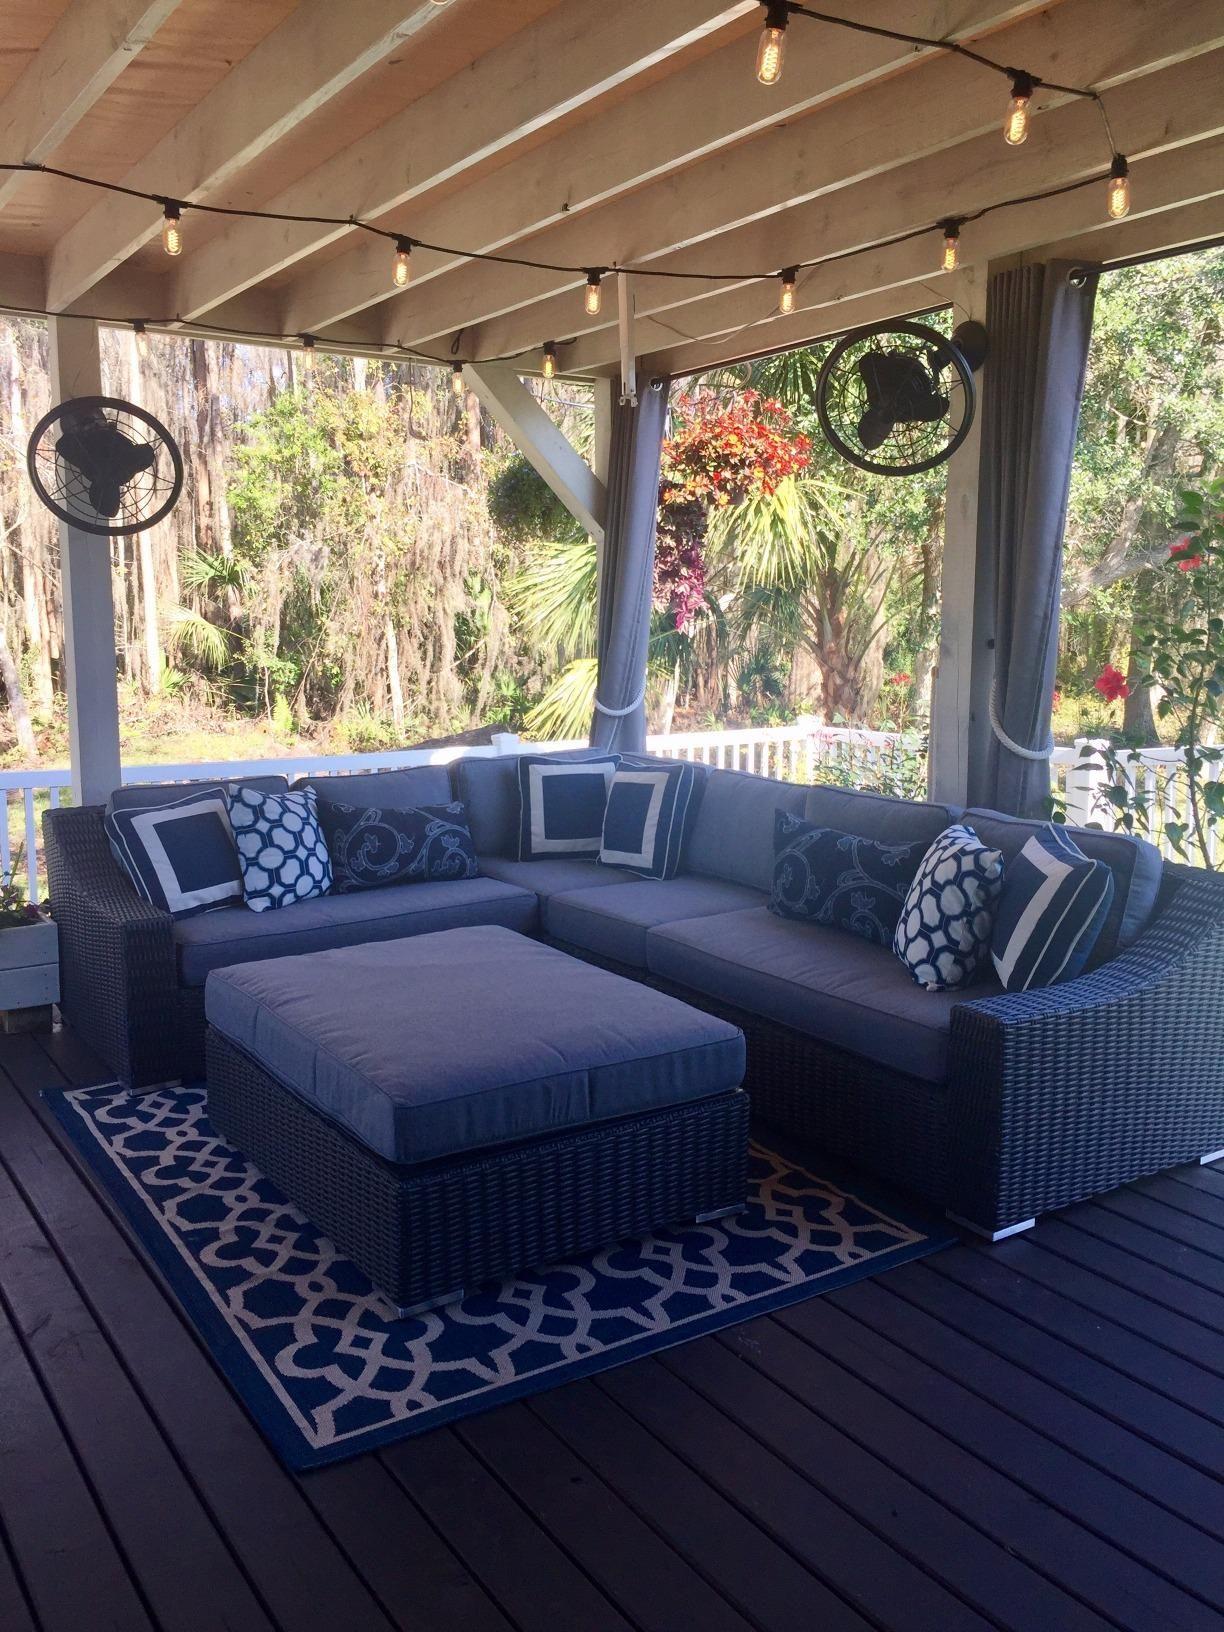 Amazon Com Customer Reviews Toja Turo Outdoor Patio Sectional Set 5 Pcs Wicker Rattan Body Patio Sectional Sectional Patio Furniture Patio Sectional Diy